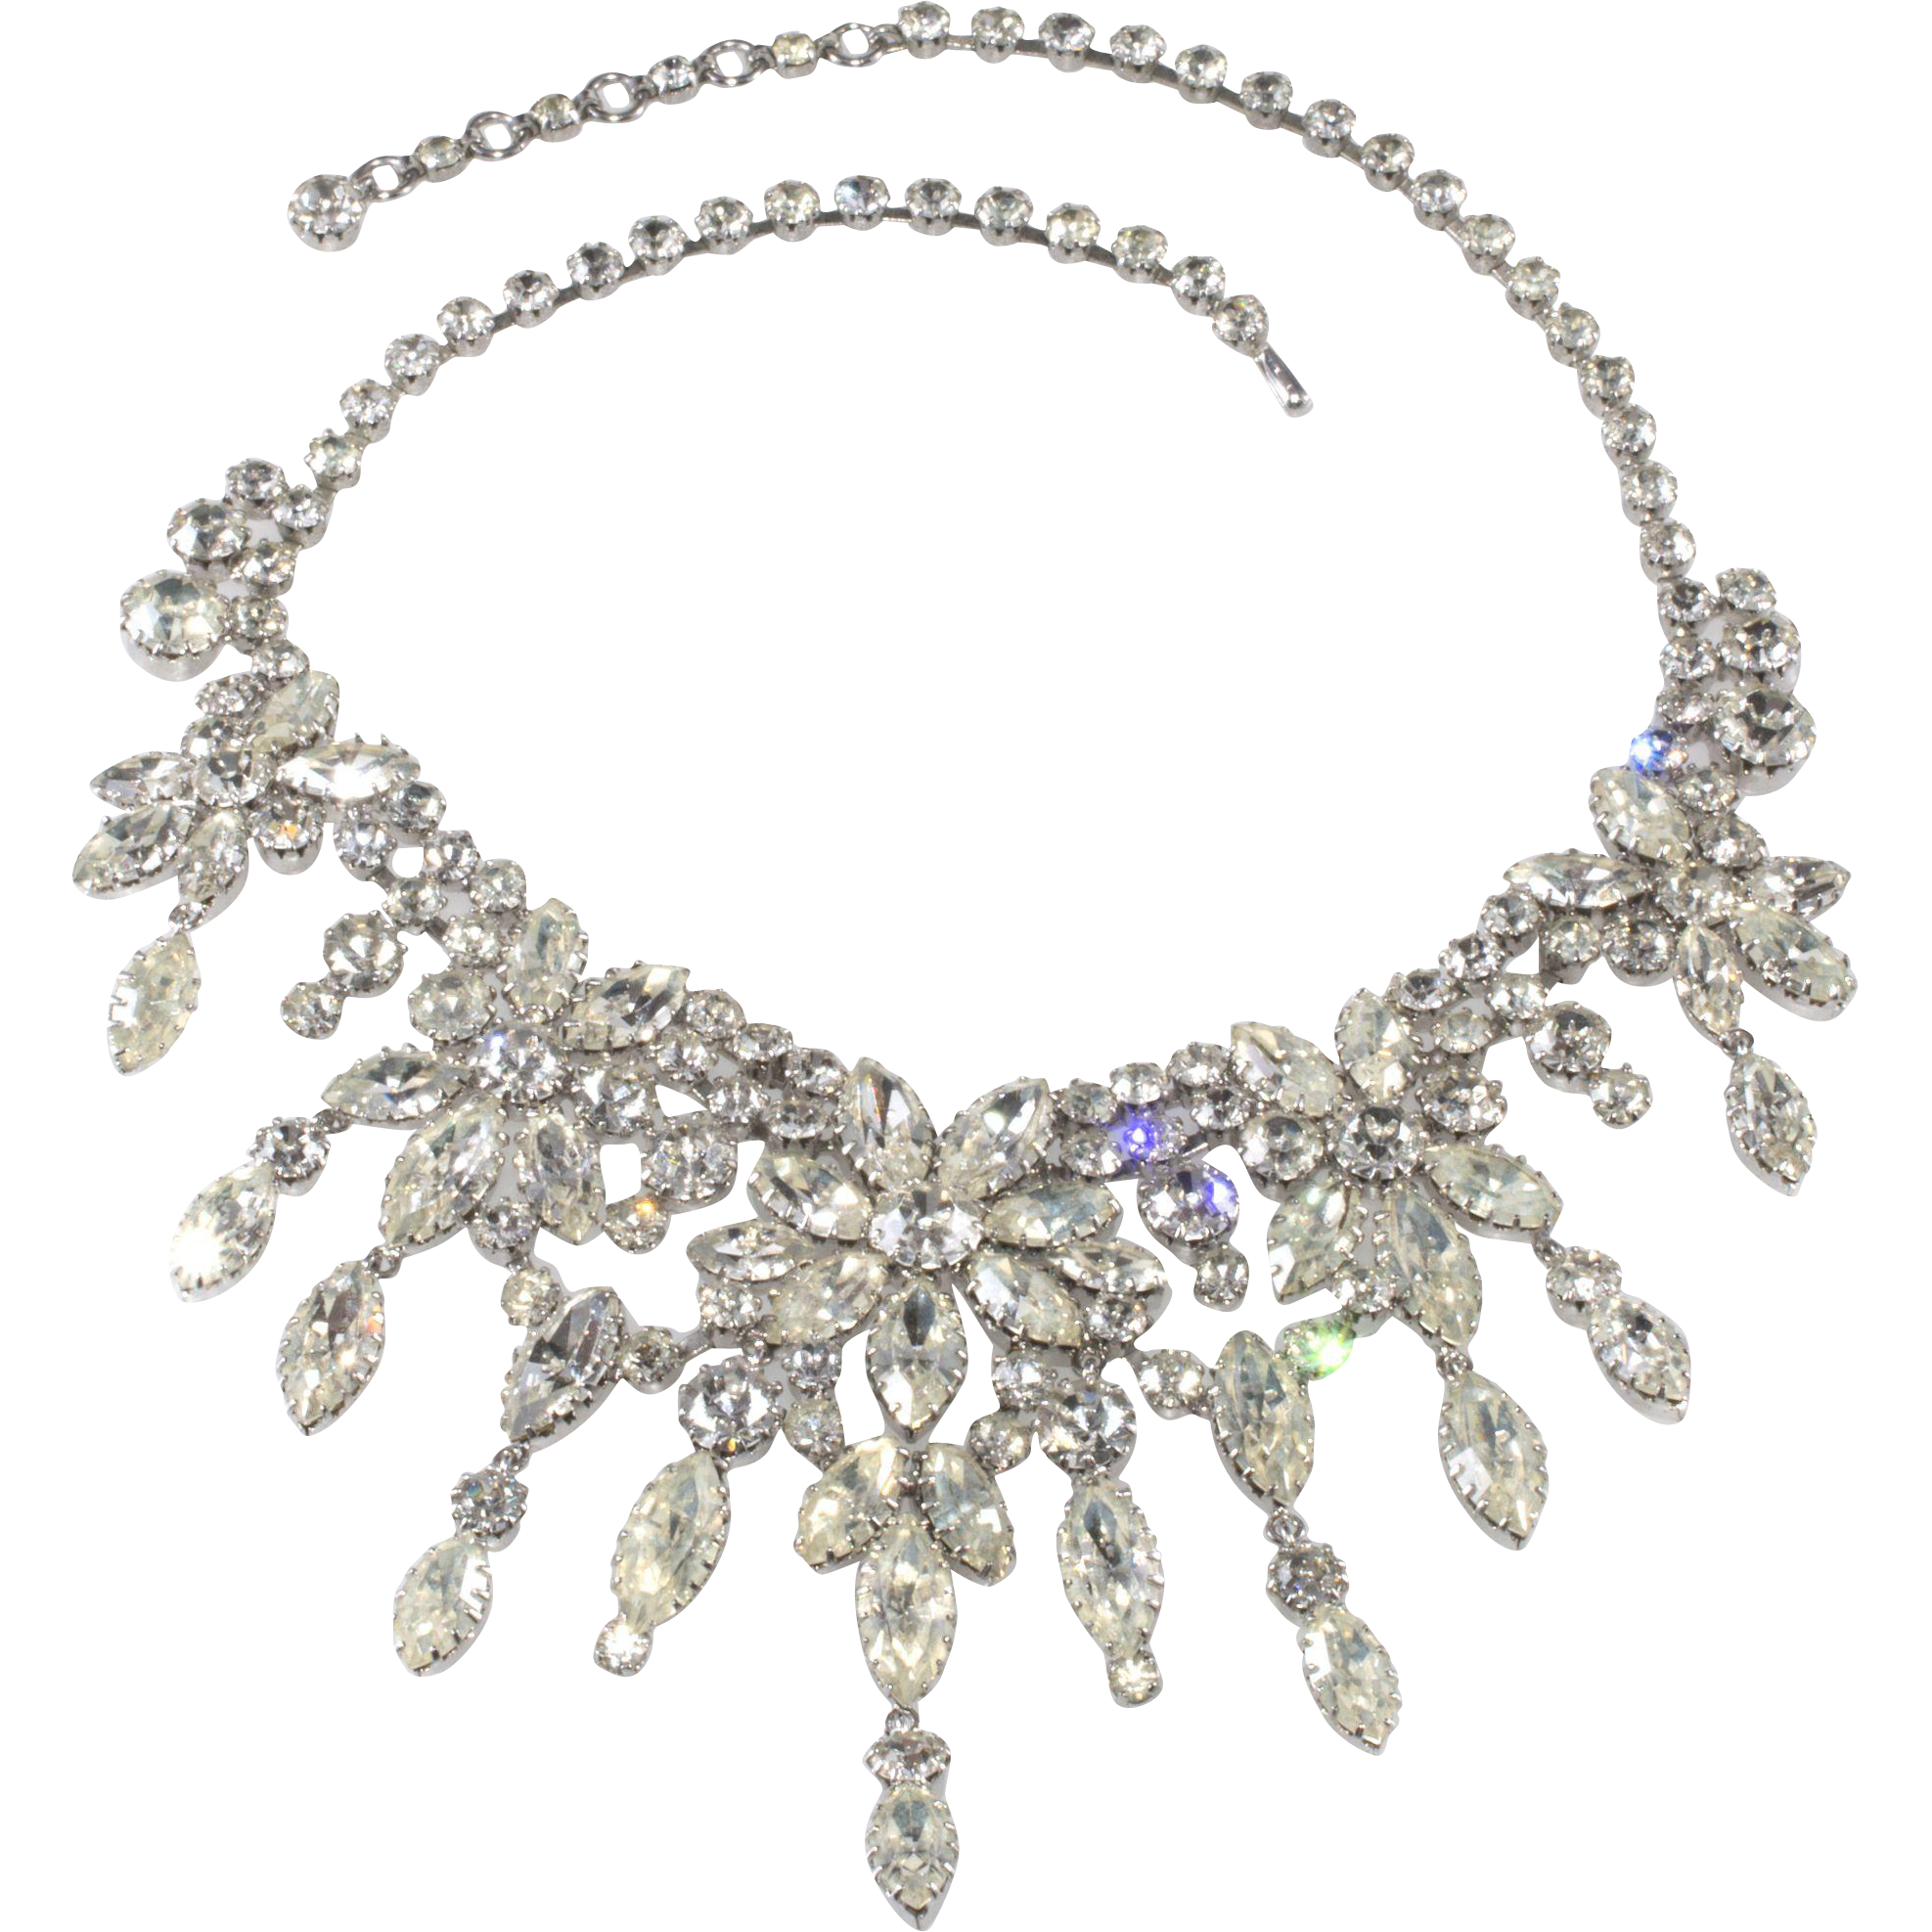 Austrian Clear Rhinestone Bib Necklace 1950s Vintage